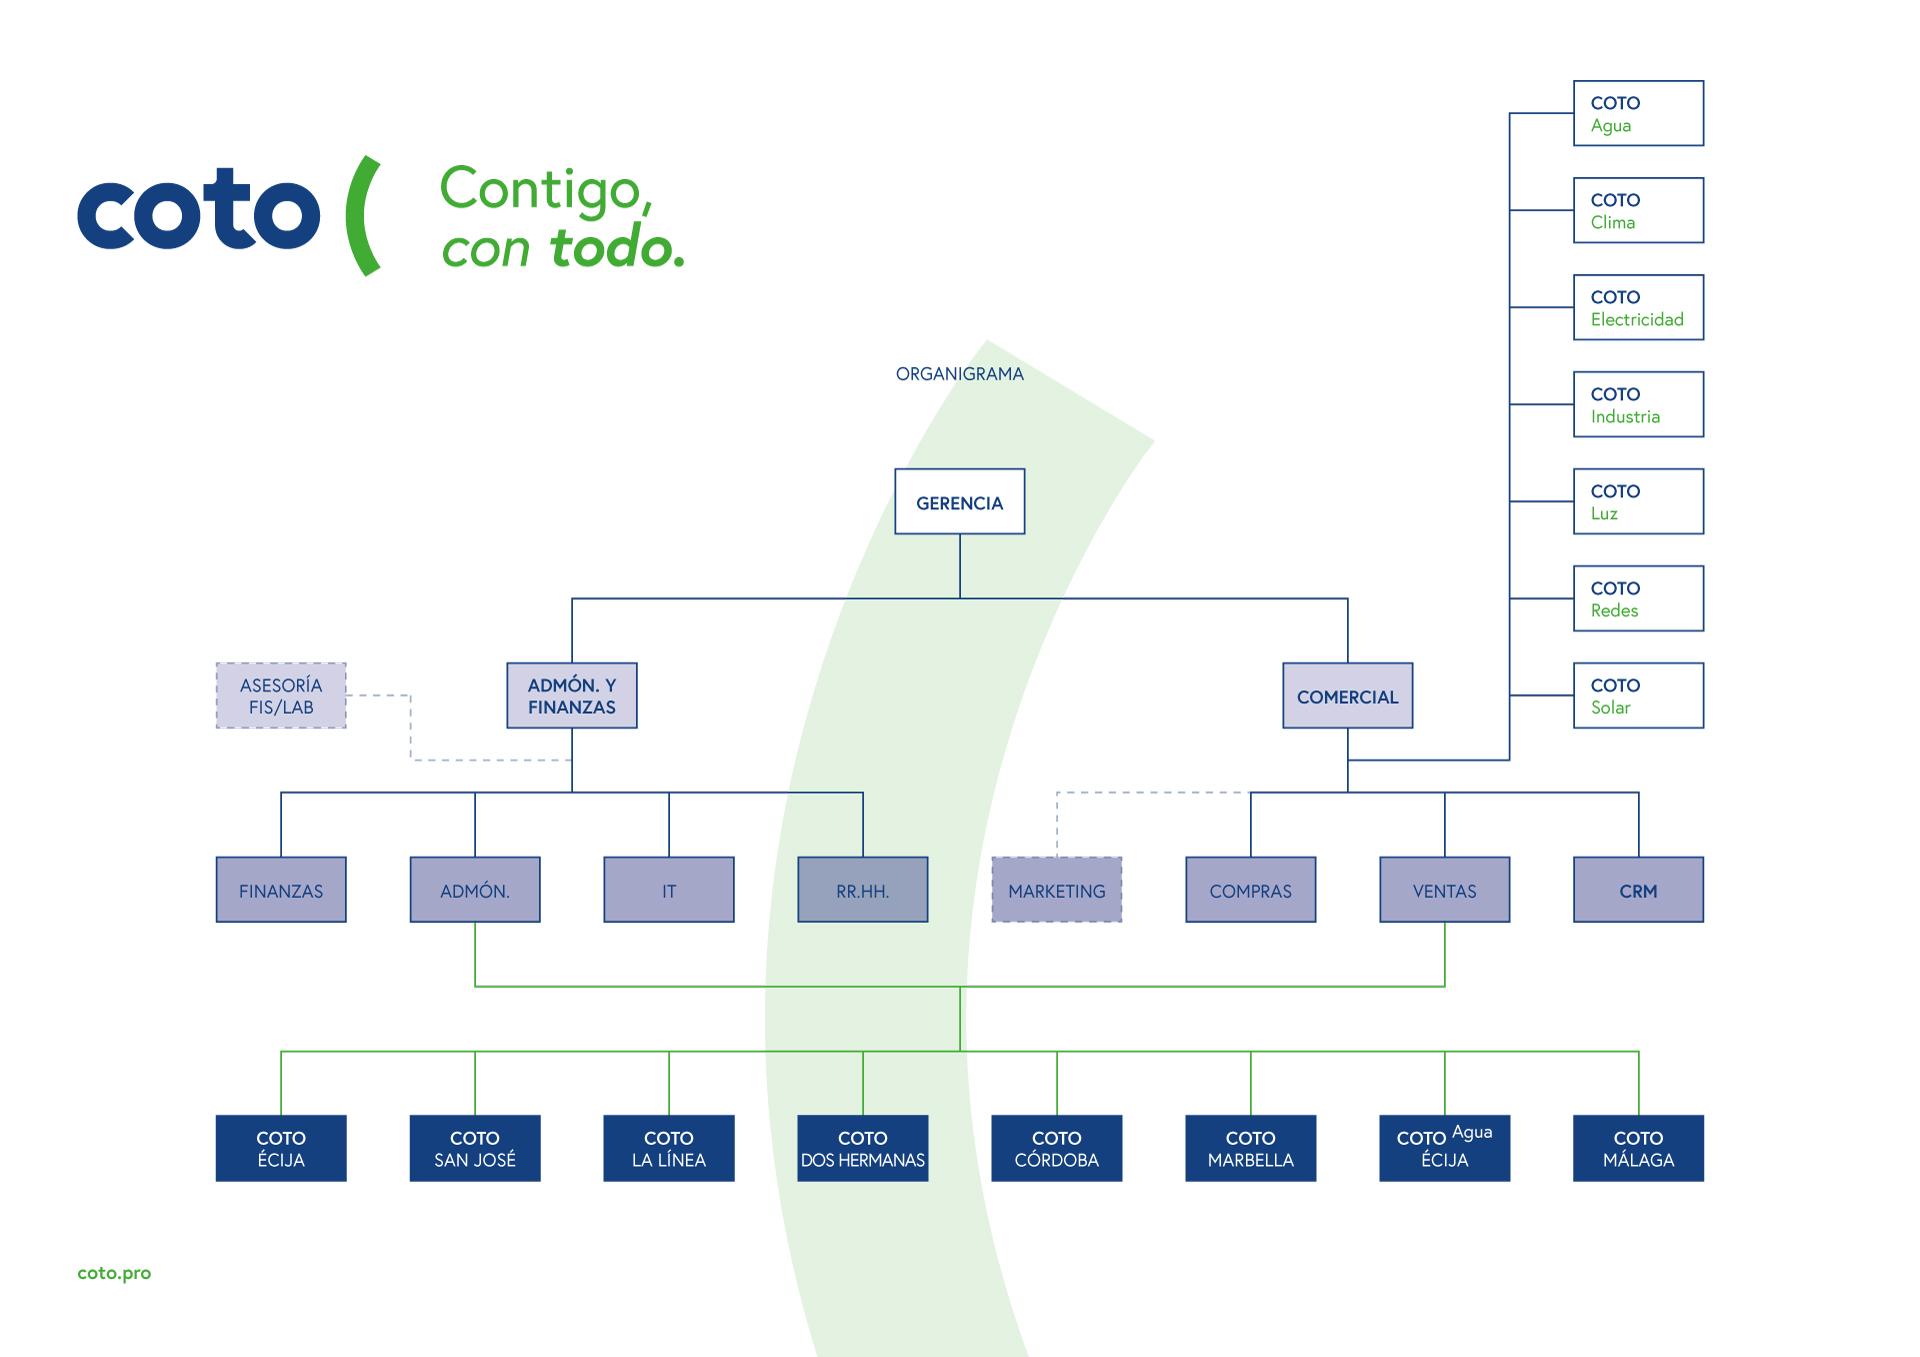 Organigram Corporativo de COTO